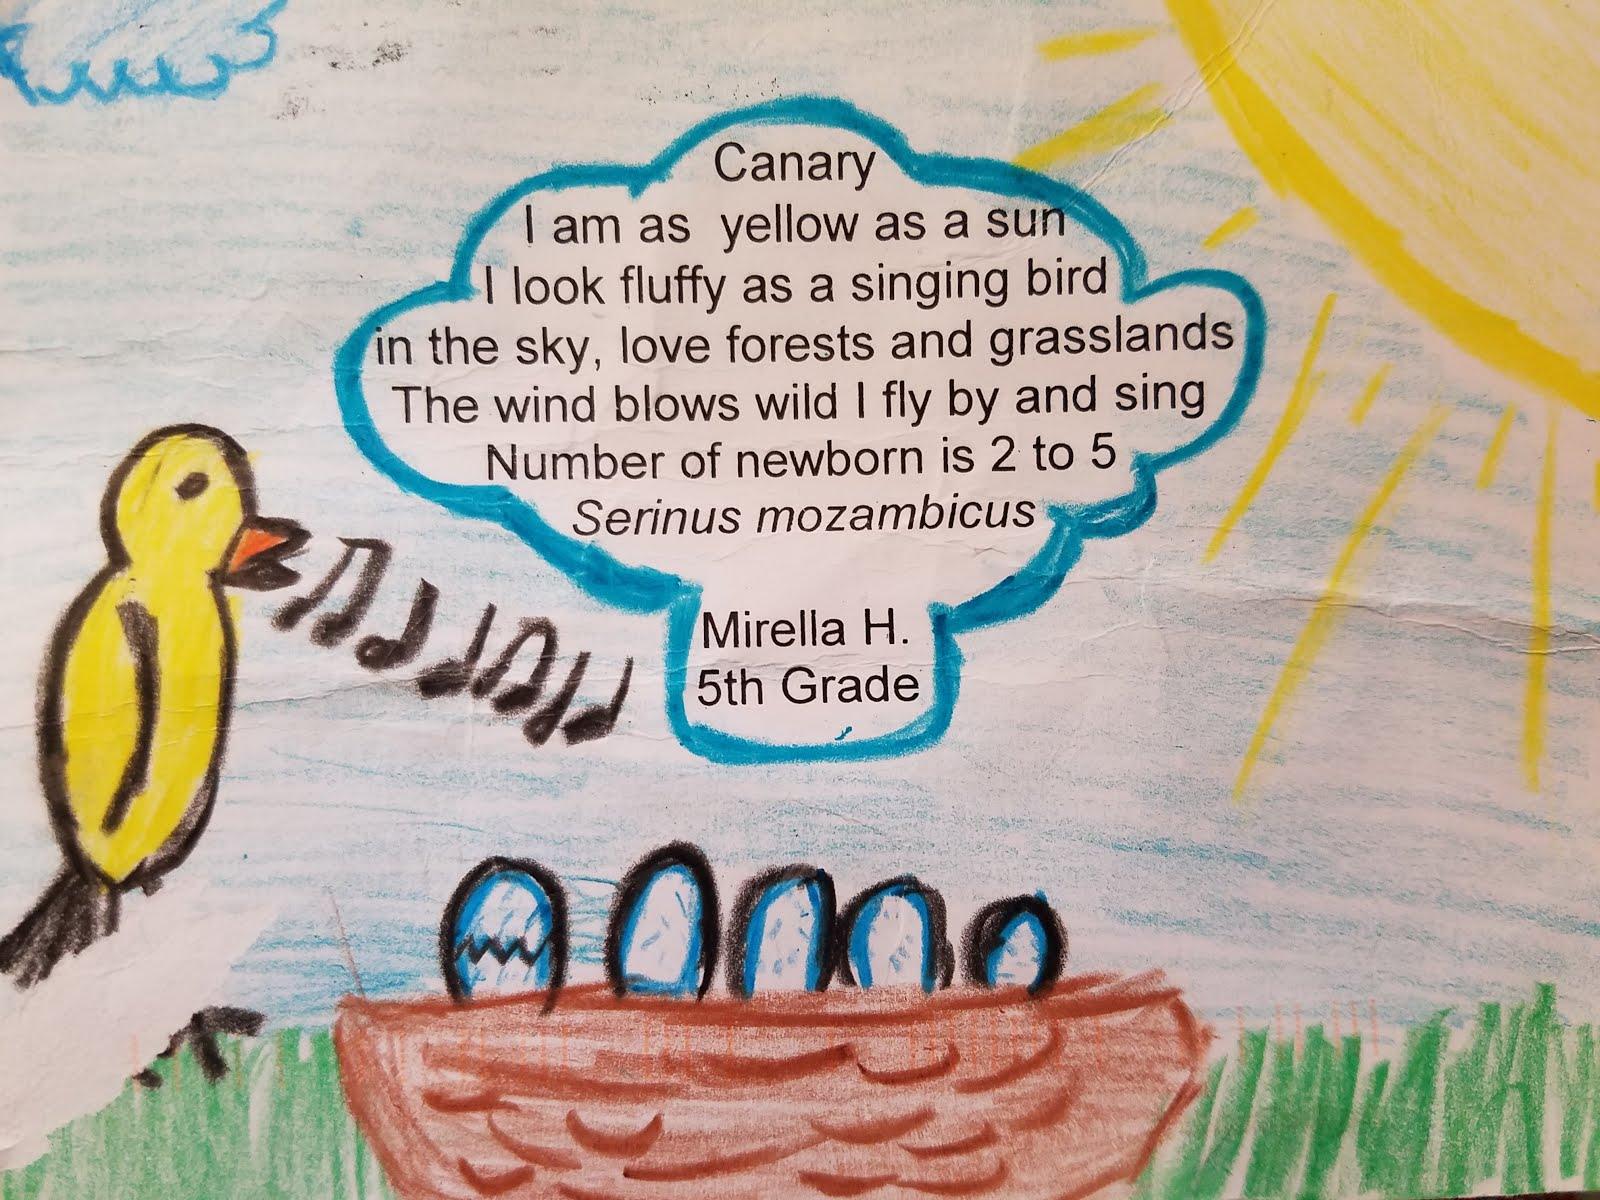 A Beautiful Poetry Postcard!